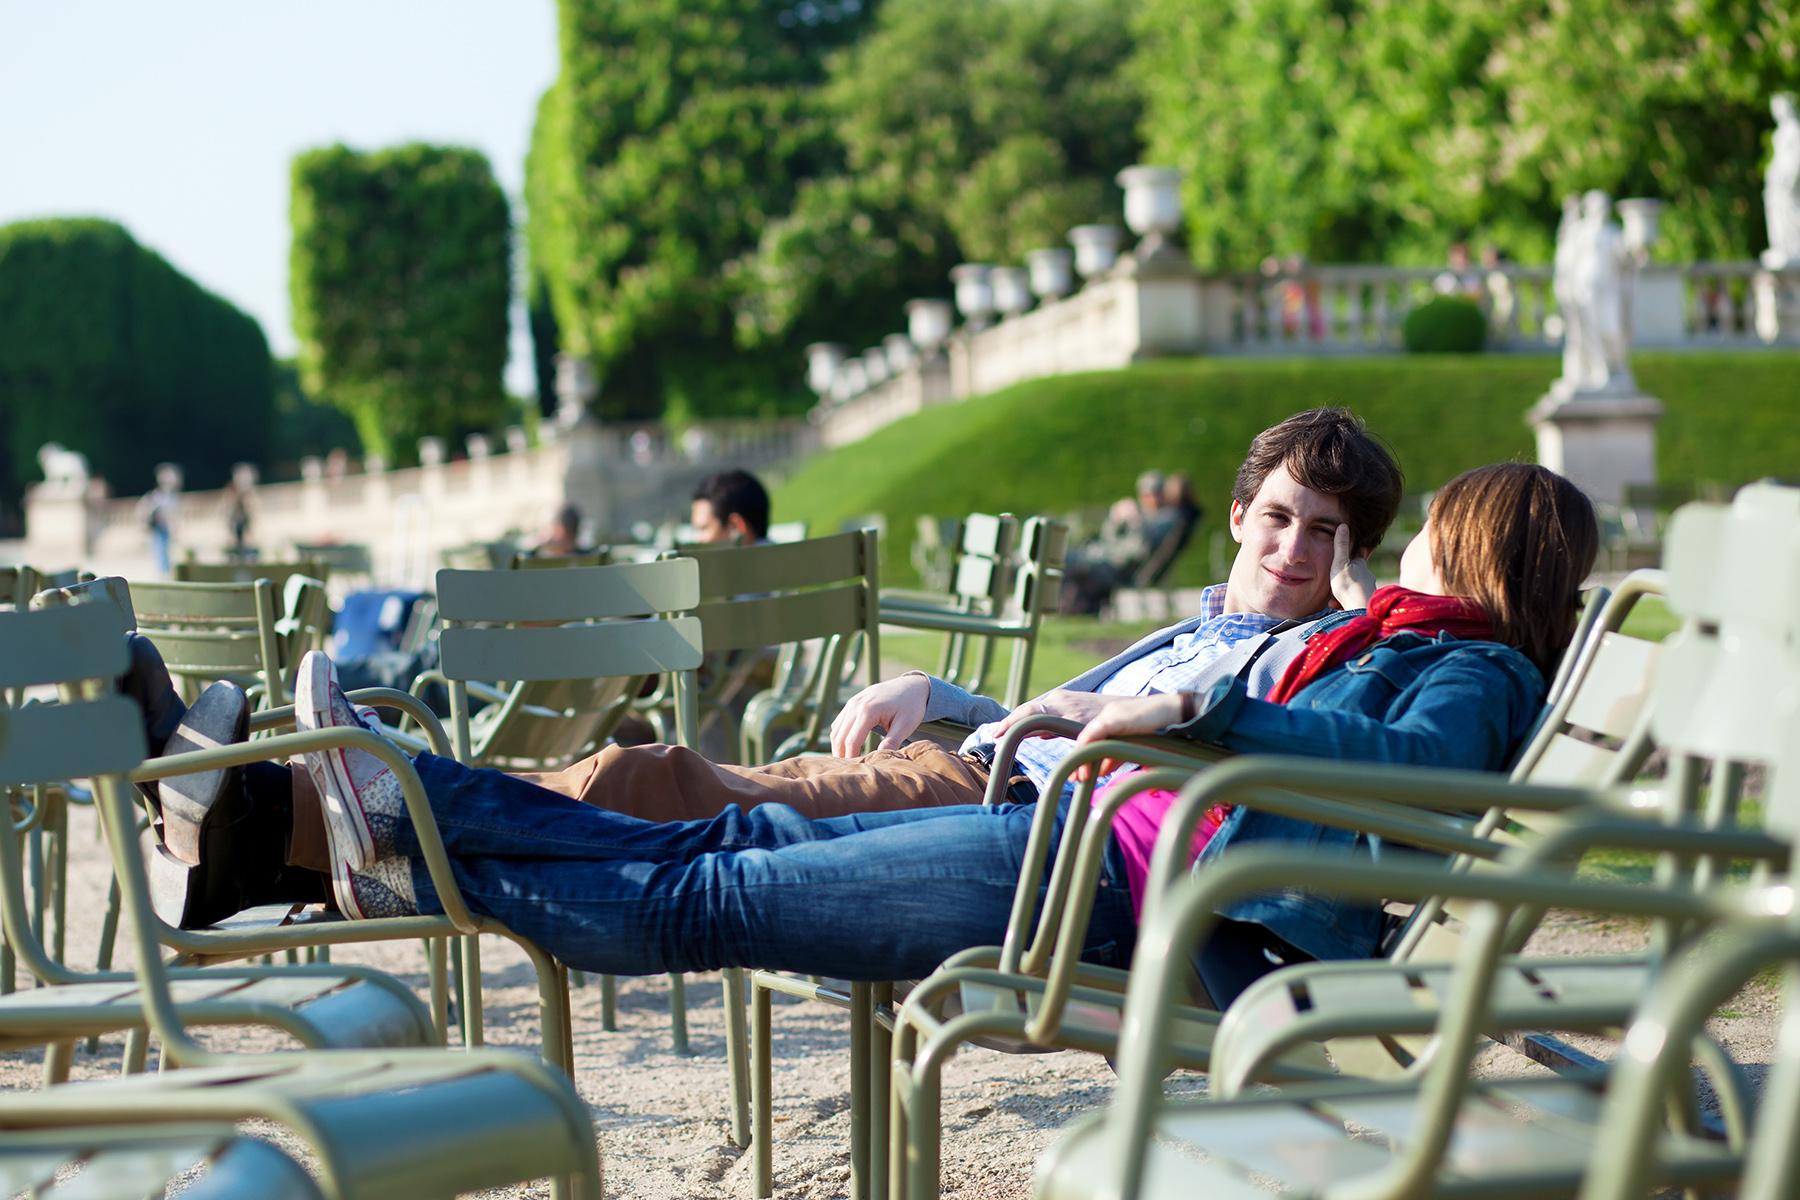 Femeie de intalnire din Luxemburg